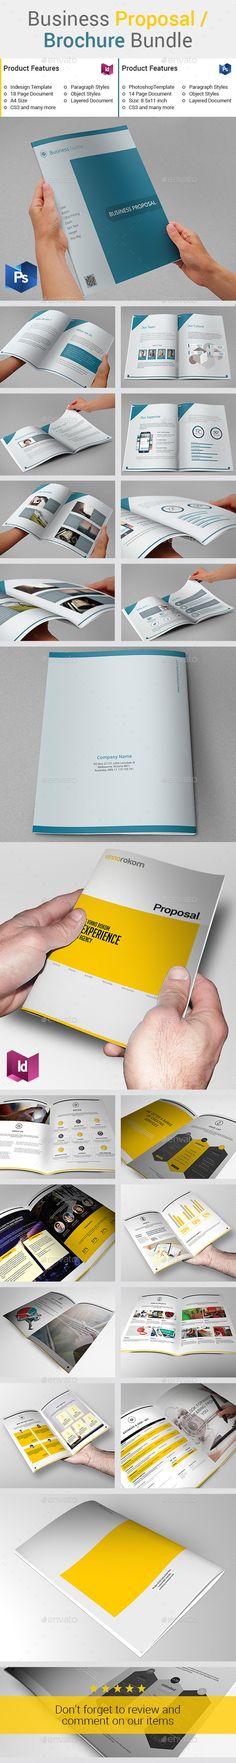 Business Proposal Business proposal, Business proposal template - business proposal template download